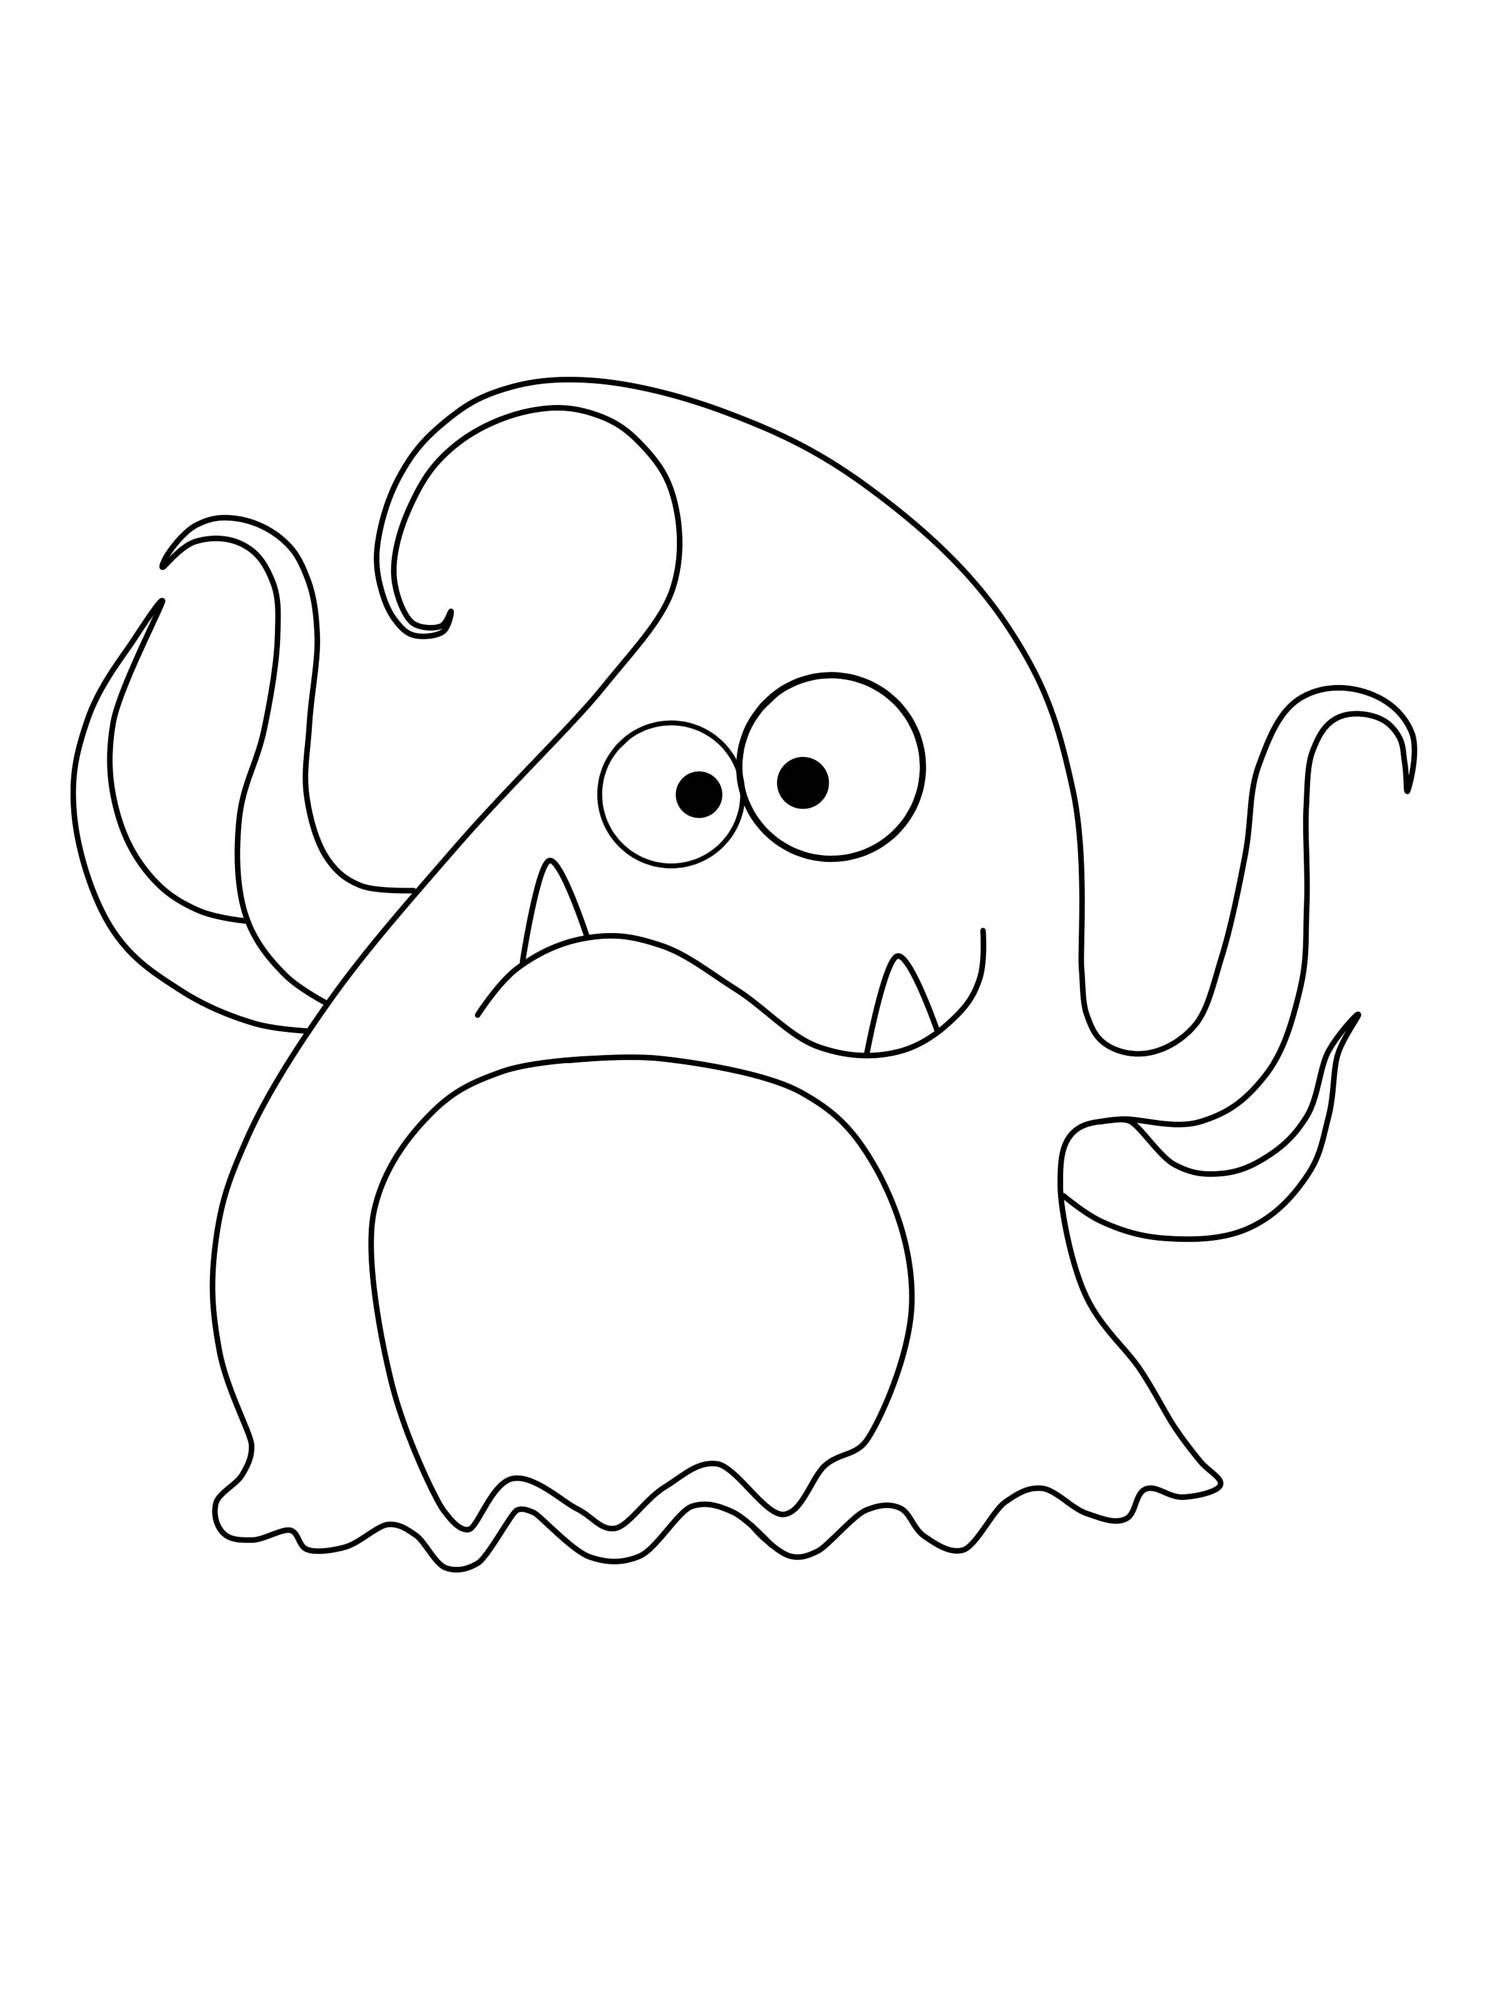 Malvorlage monster kostenlos Coloring and Malvorlagan